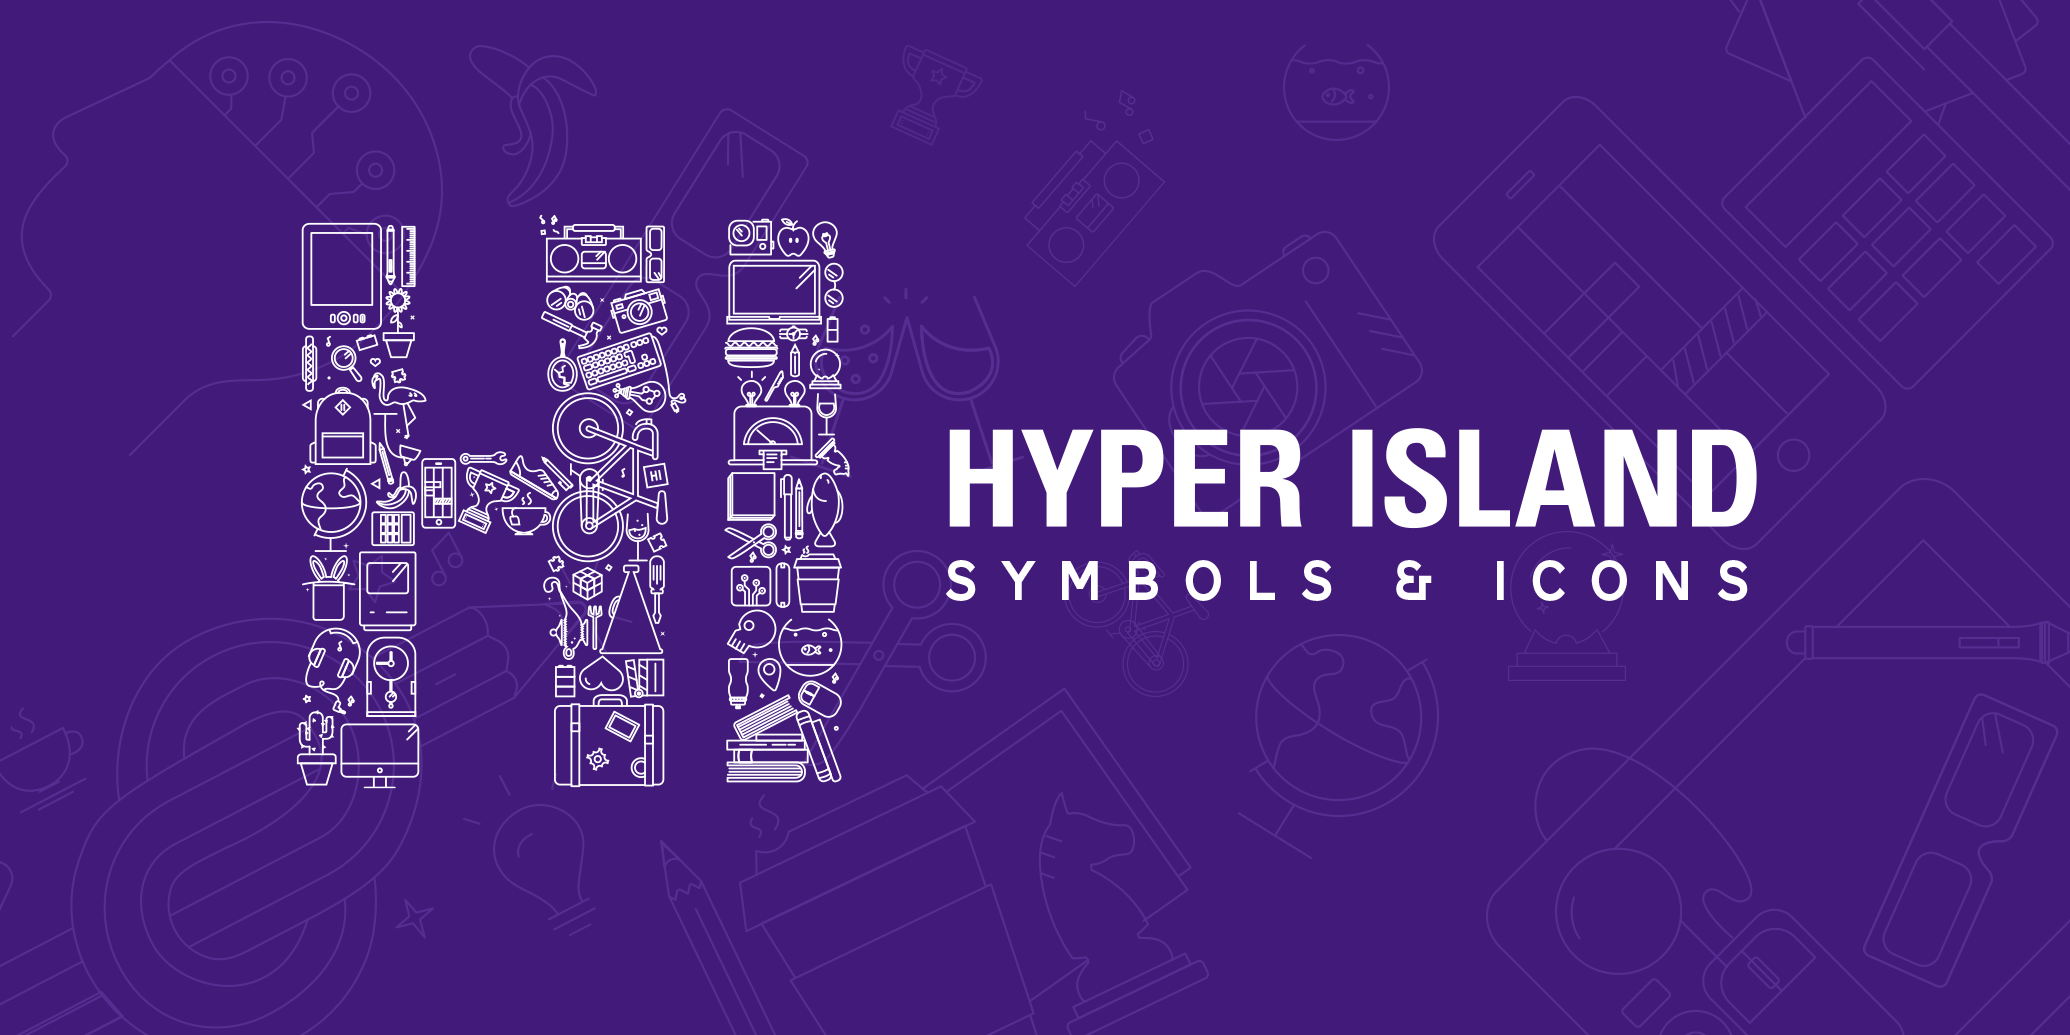 Hyper Island: Symbols & icons